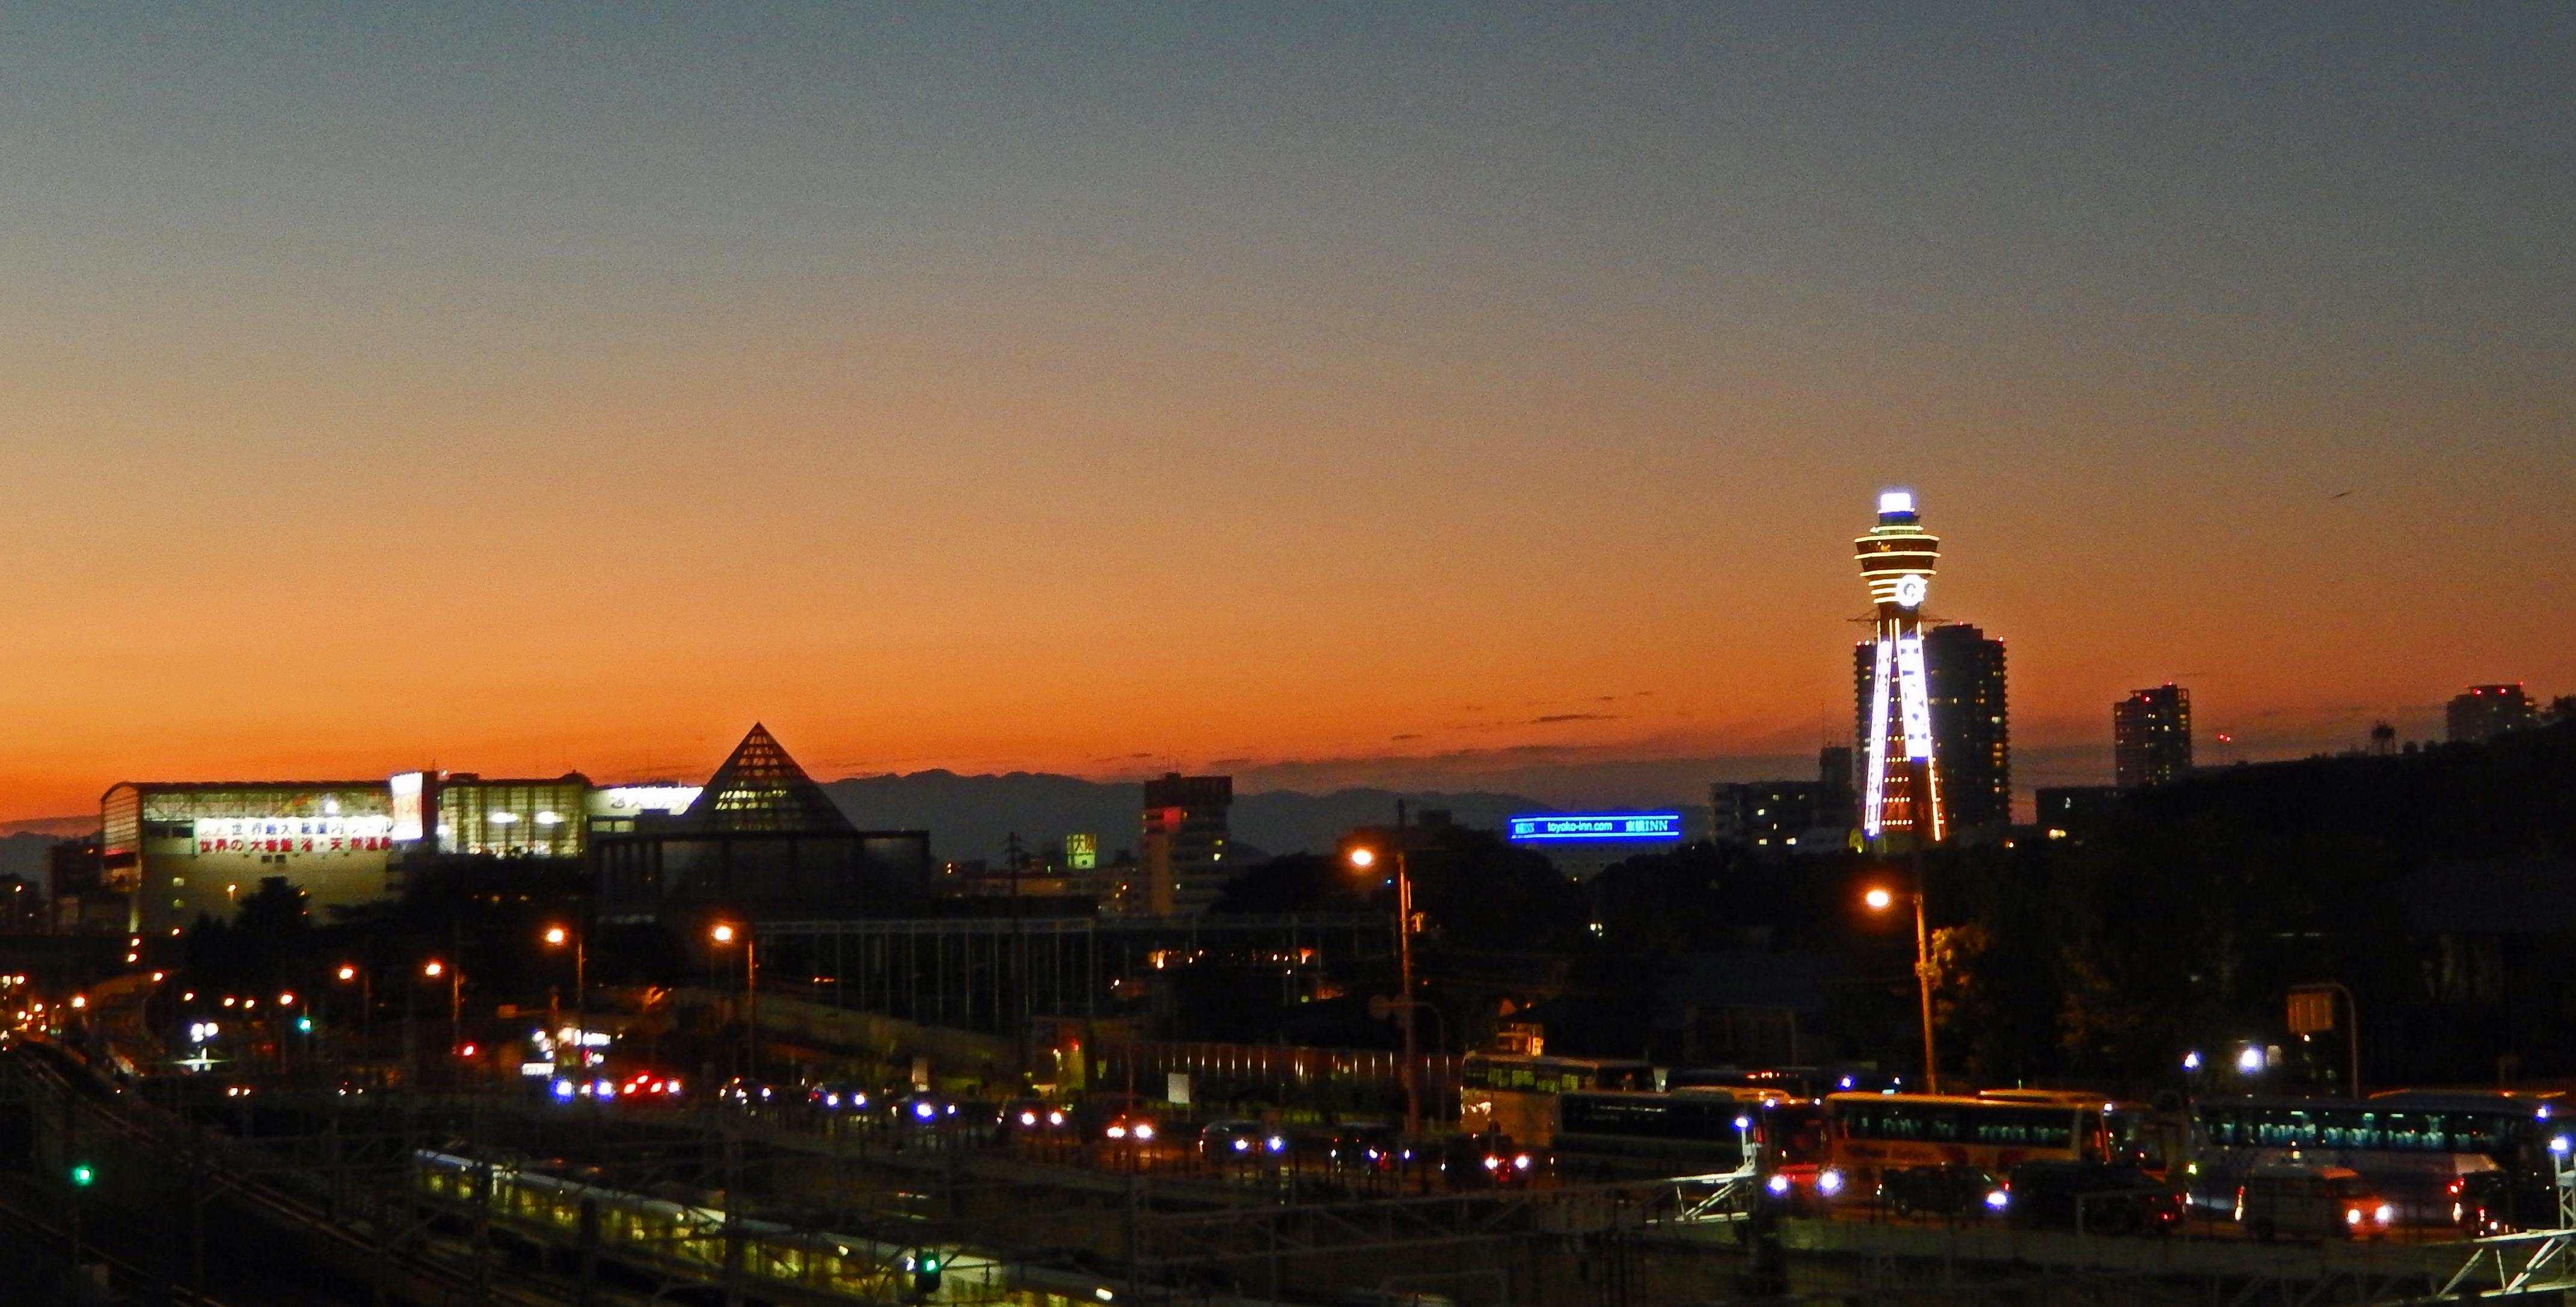 Sonnuntergang in Tennoji mit Blick auf den Hitachi-Turm in Osaka.